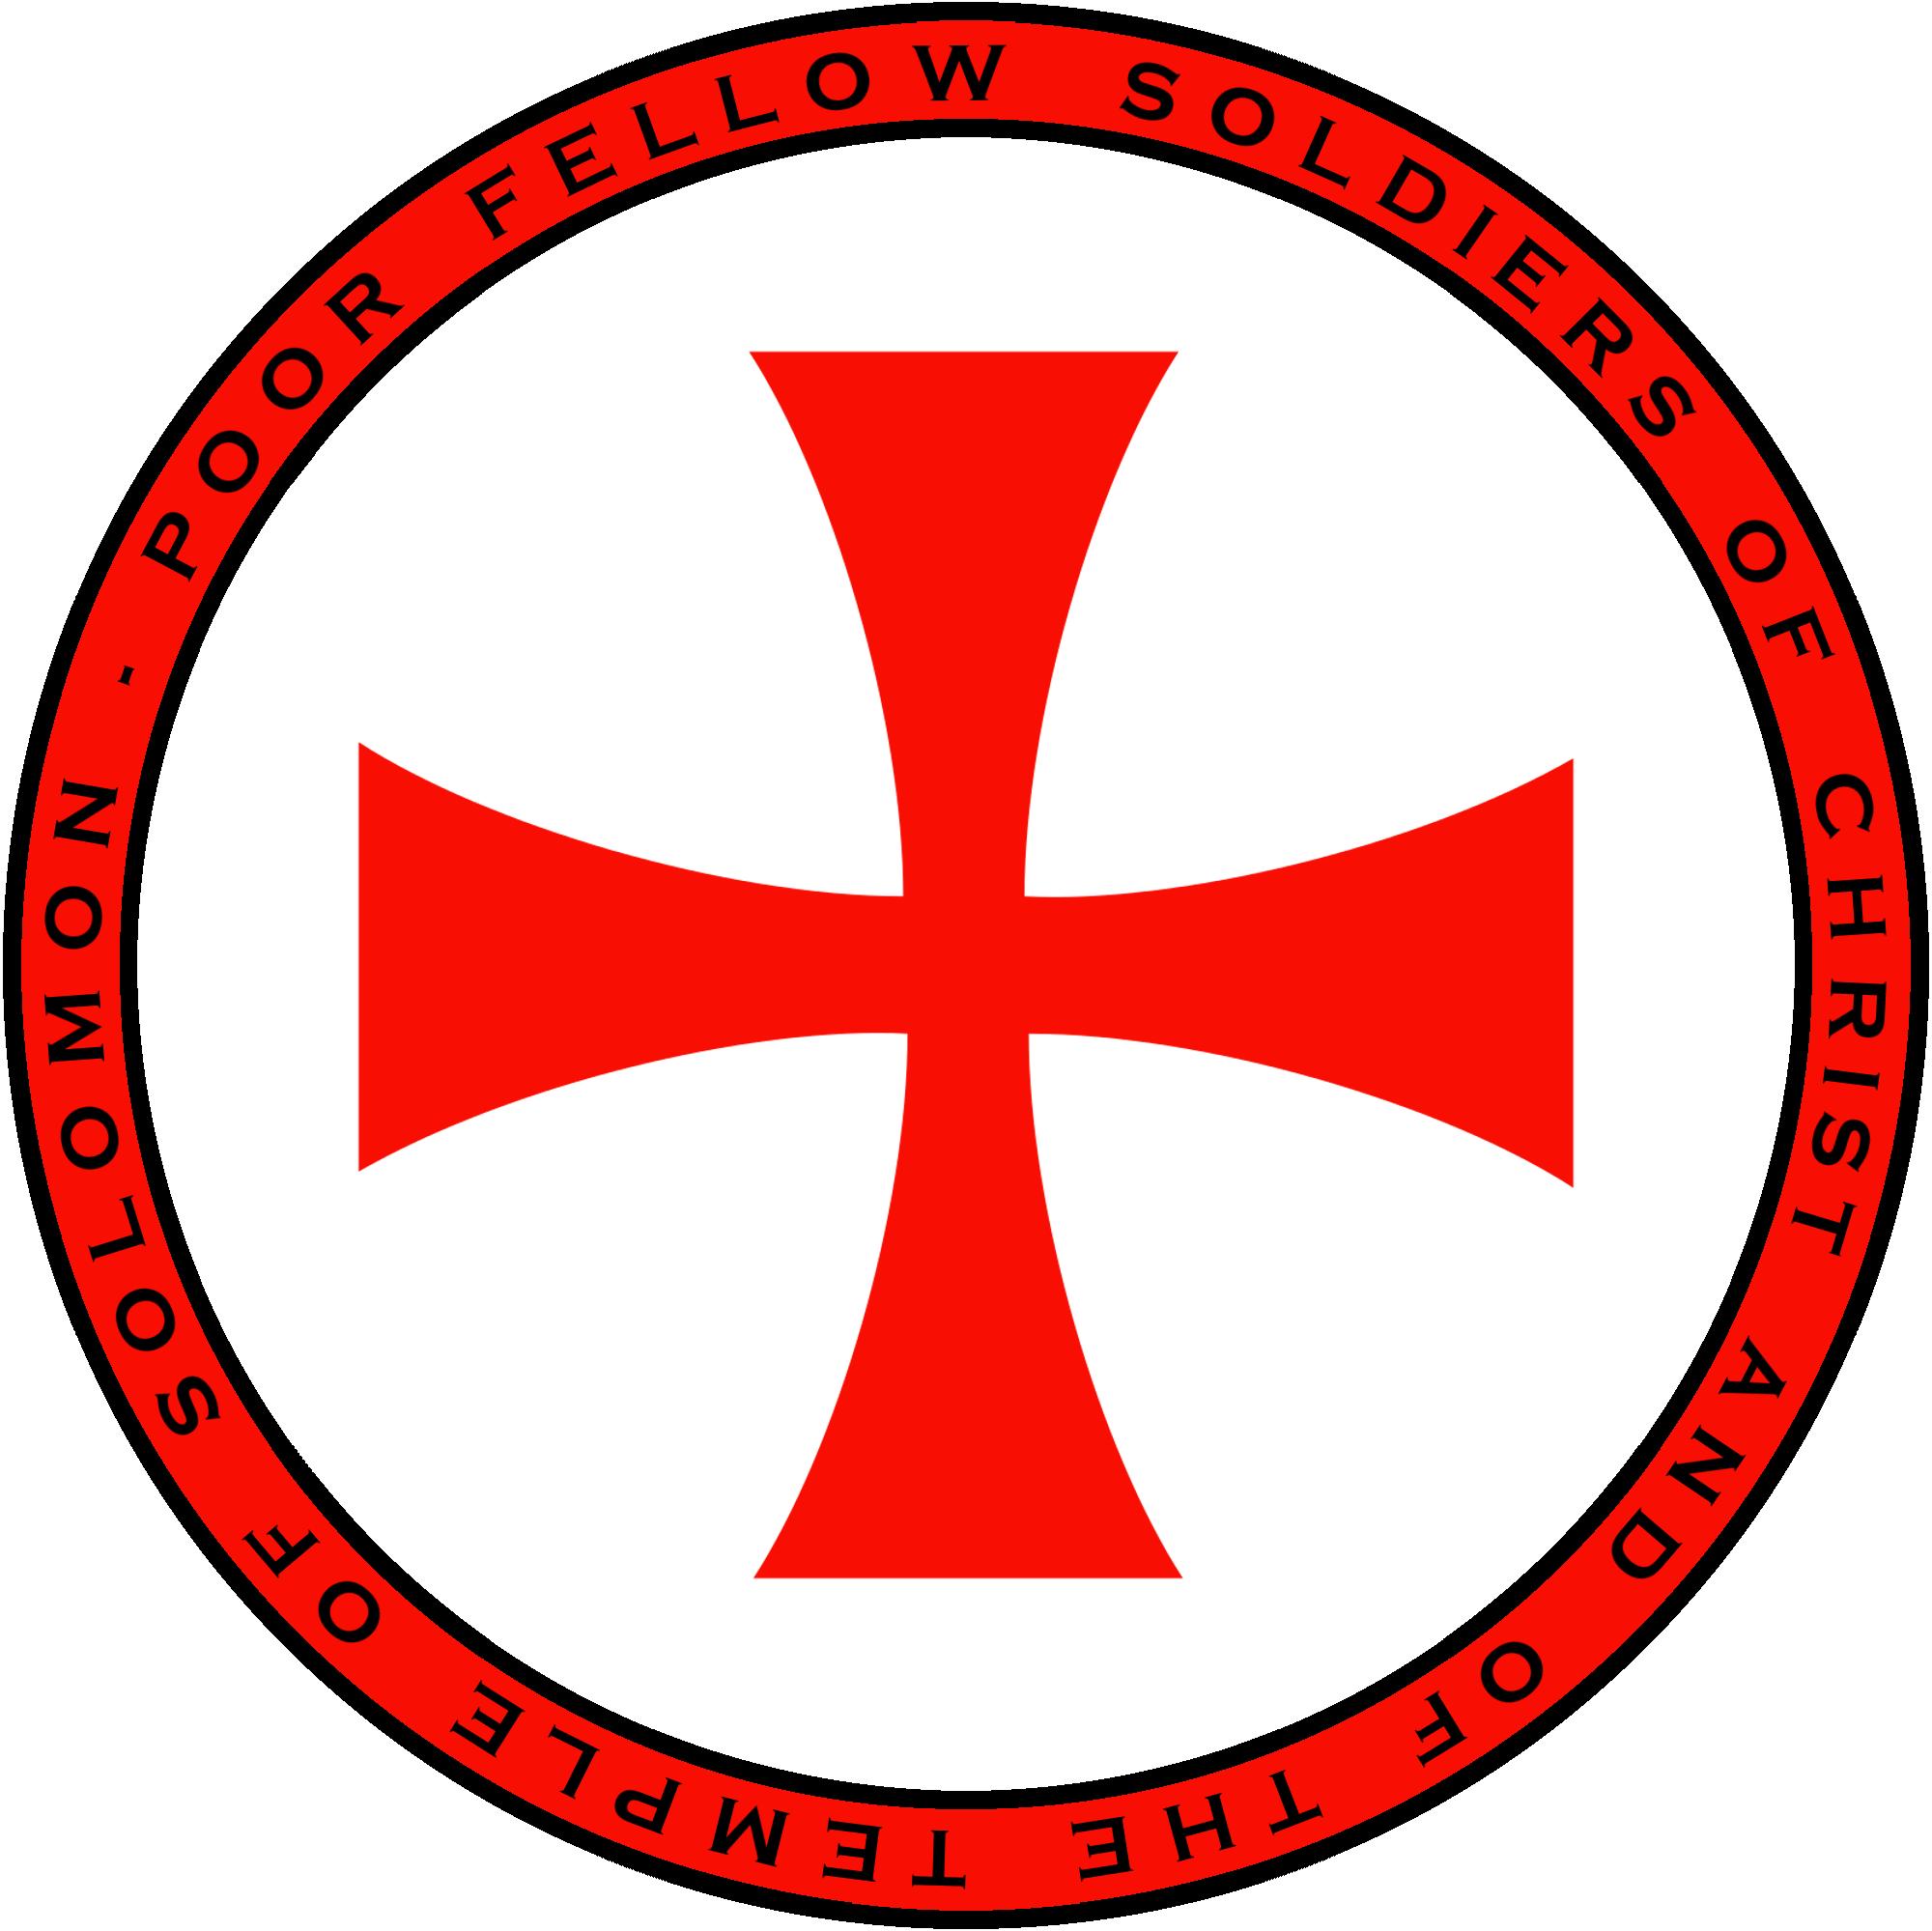 Knights Templar Round Caballeros Templarios Pinterest